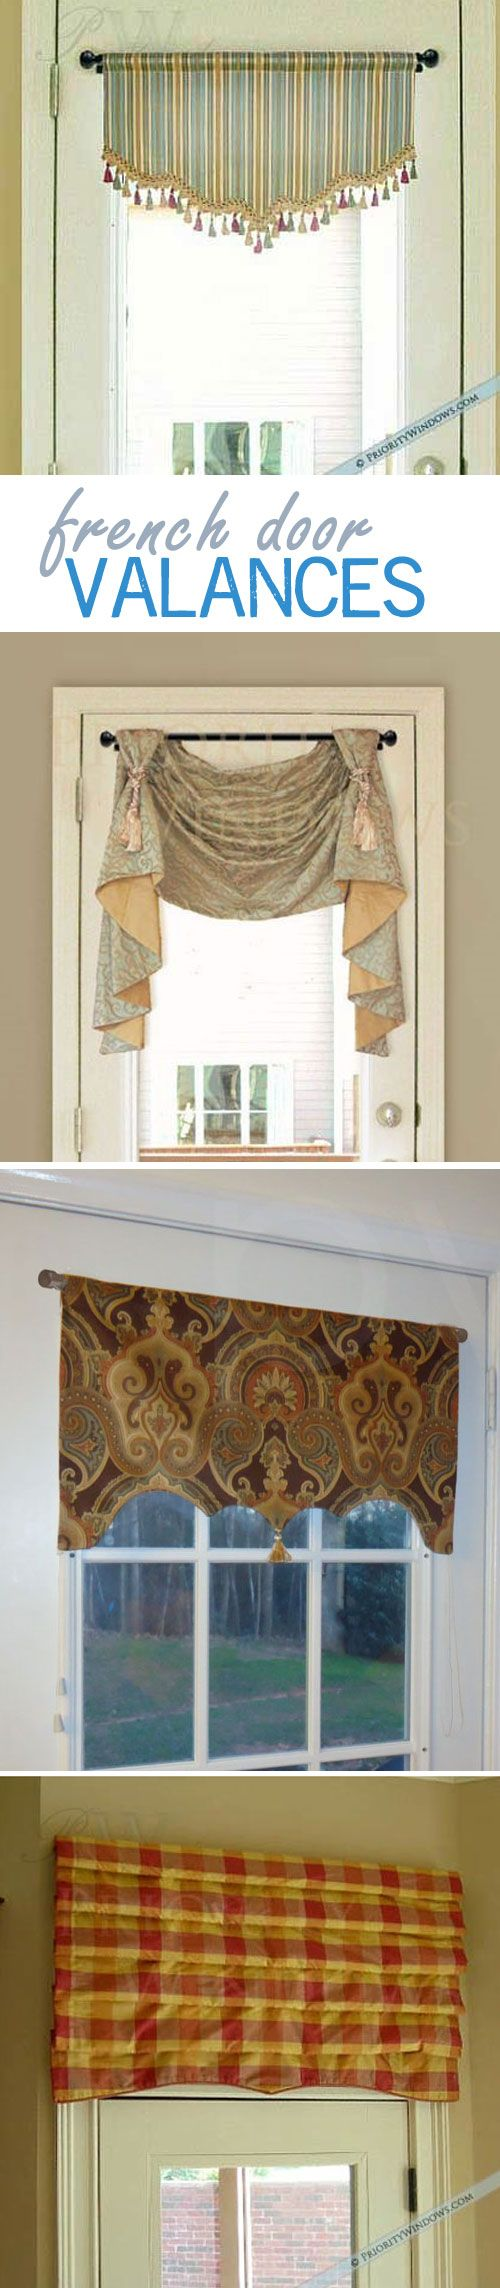 Window coverings for french doors patio doors -  Valances For French Doors Patio Doors Custom